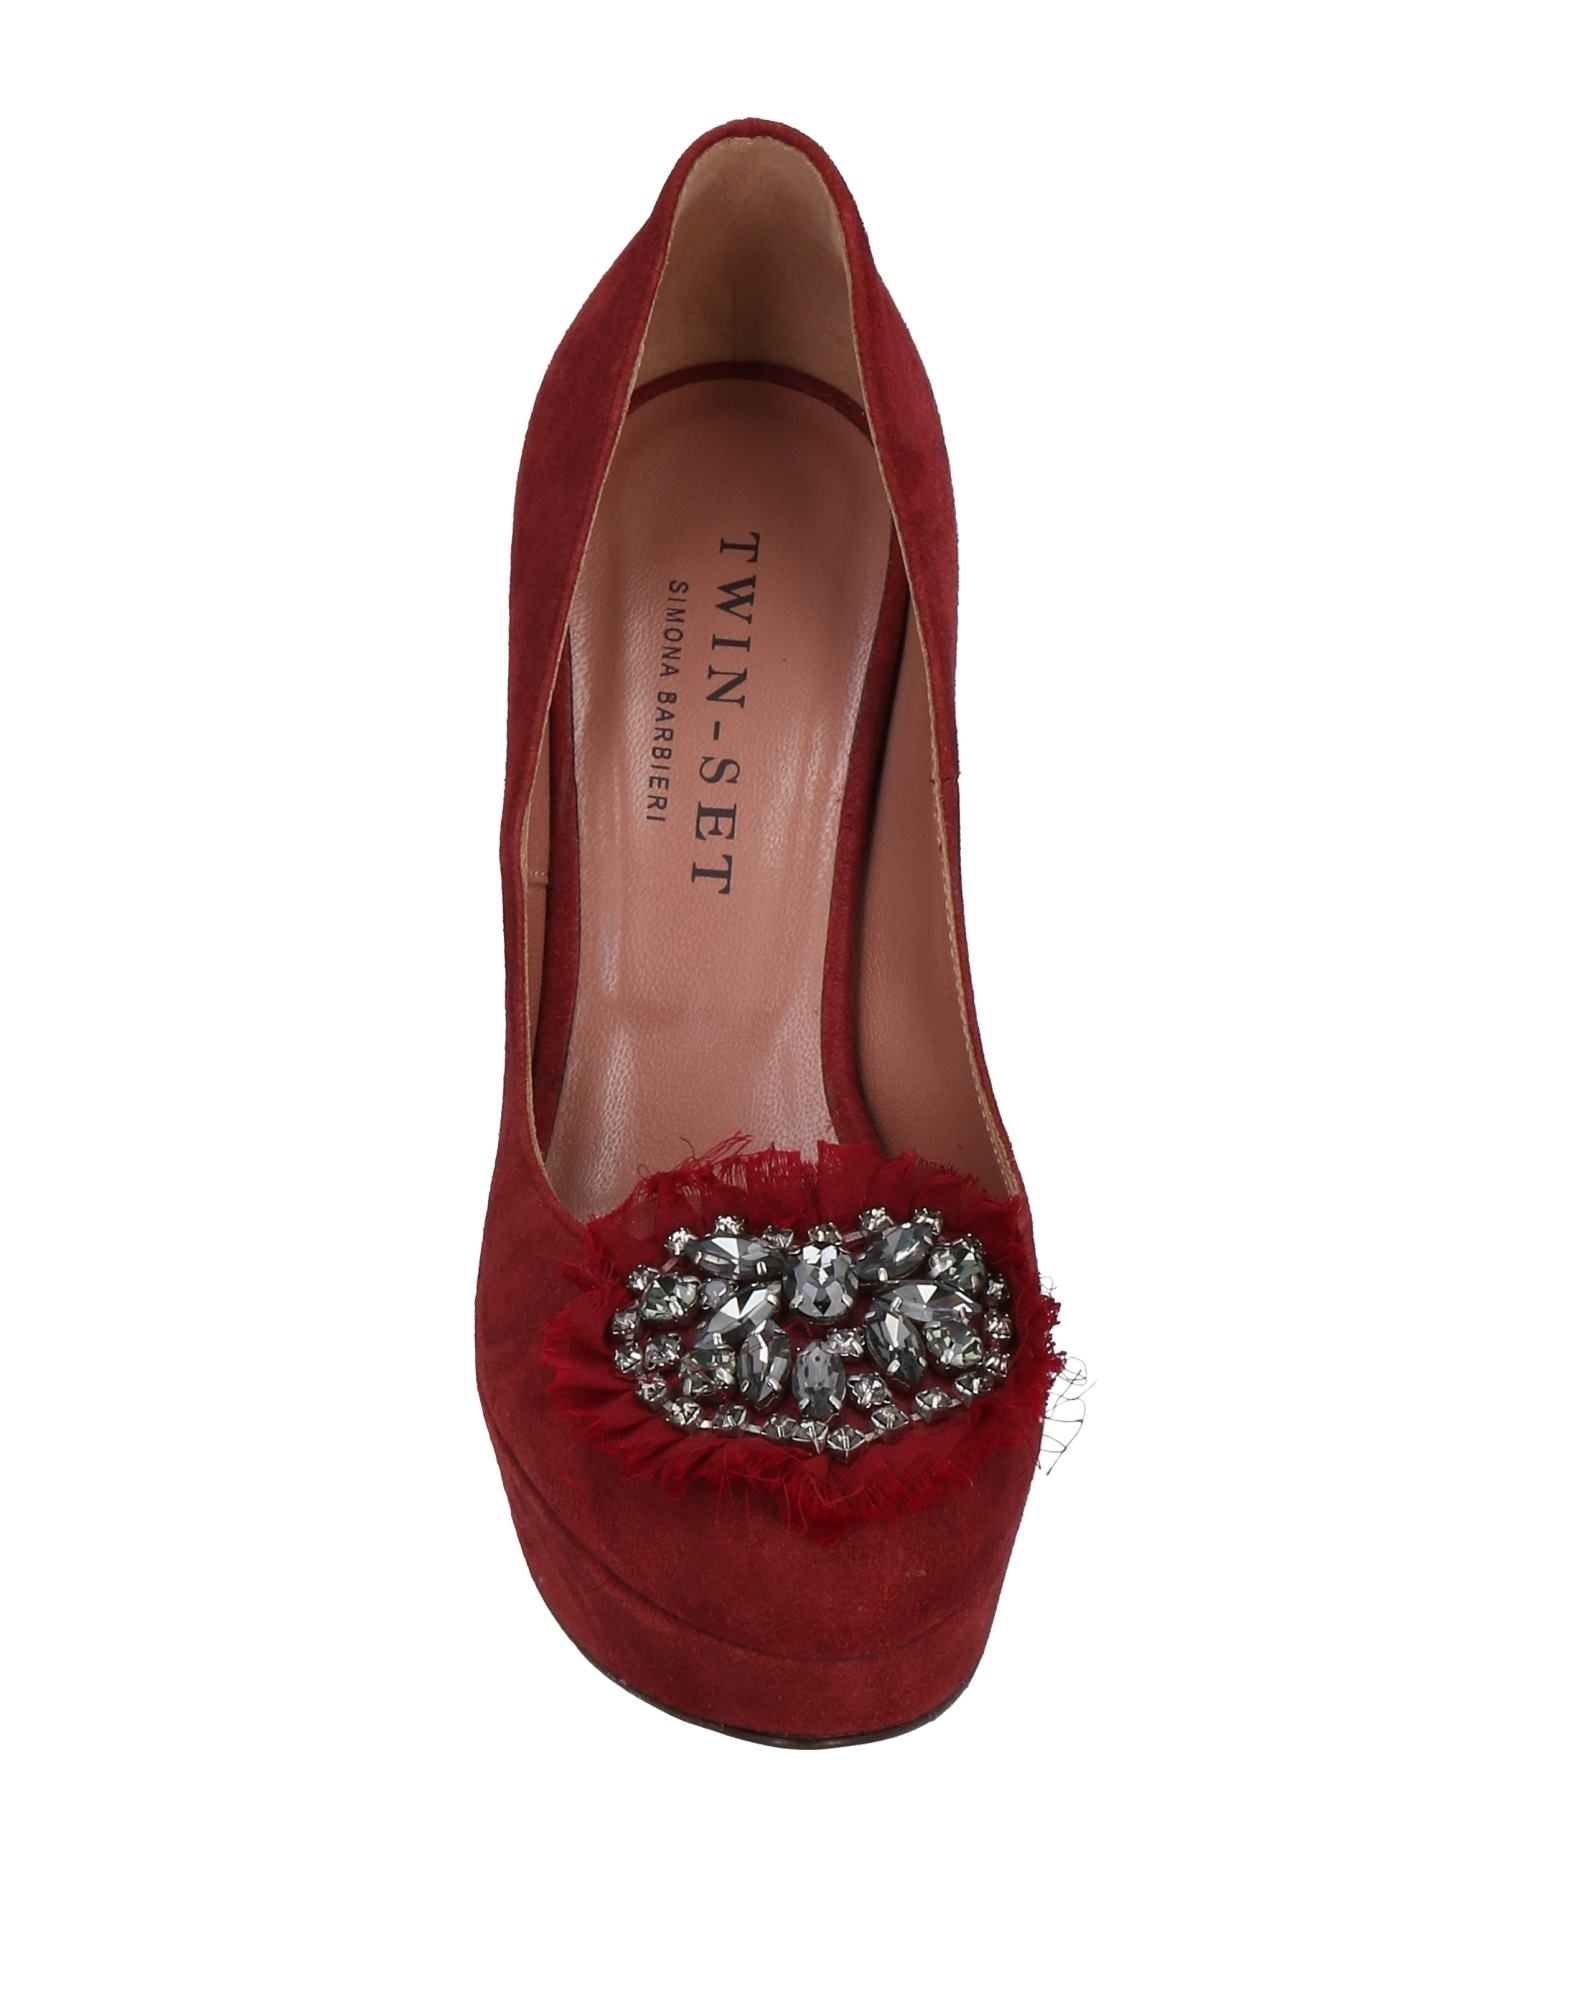 Stilvolle billige Schuhe Schuhe Schuhe Twin 11493641QE dbcc7d